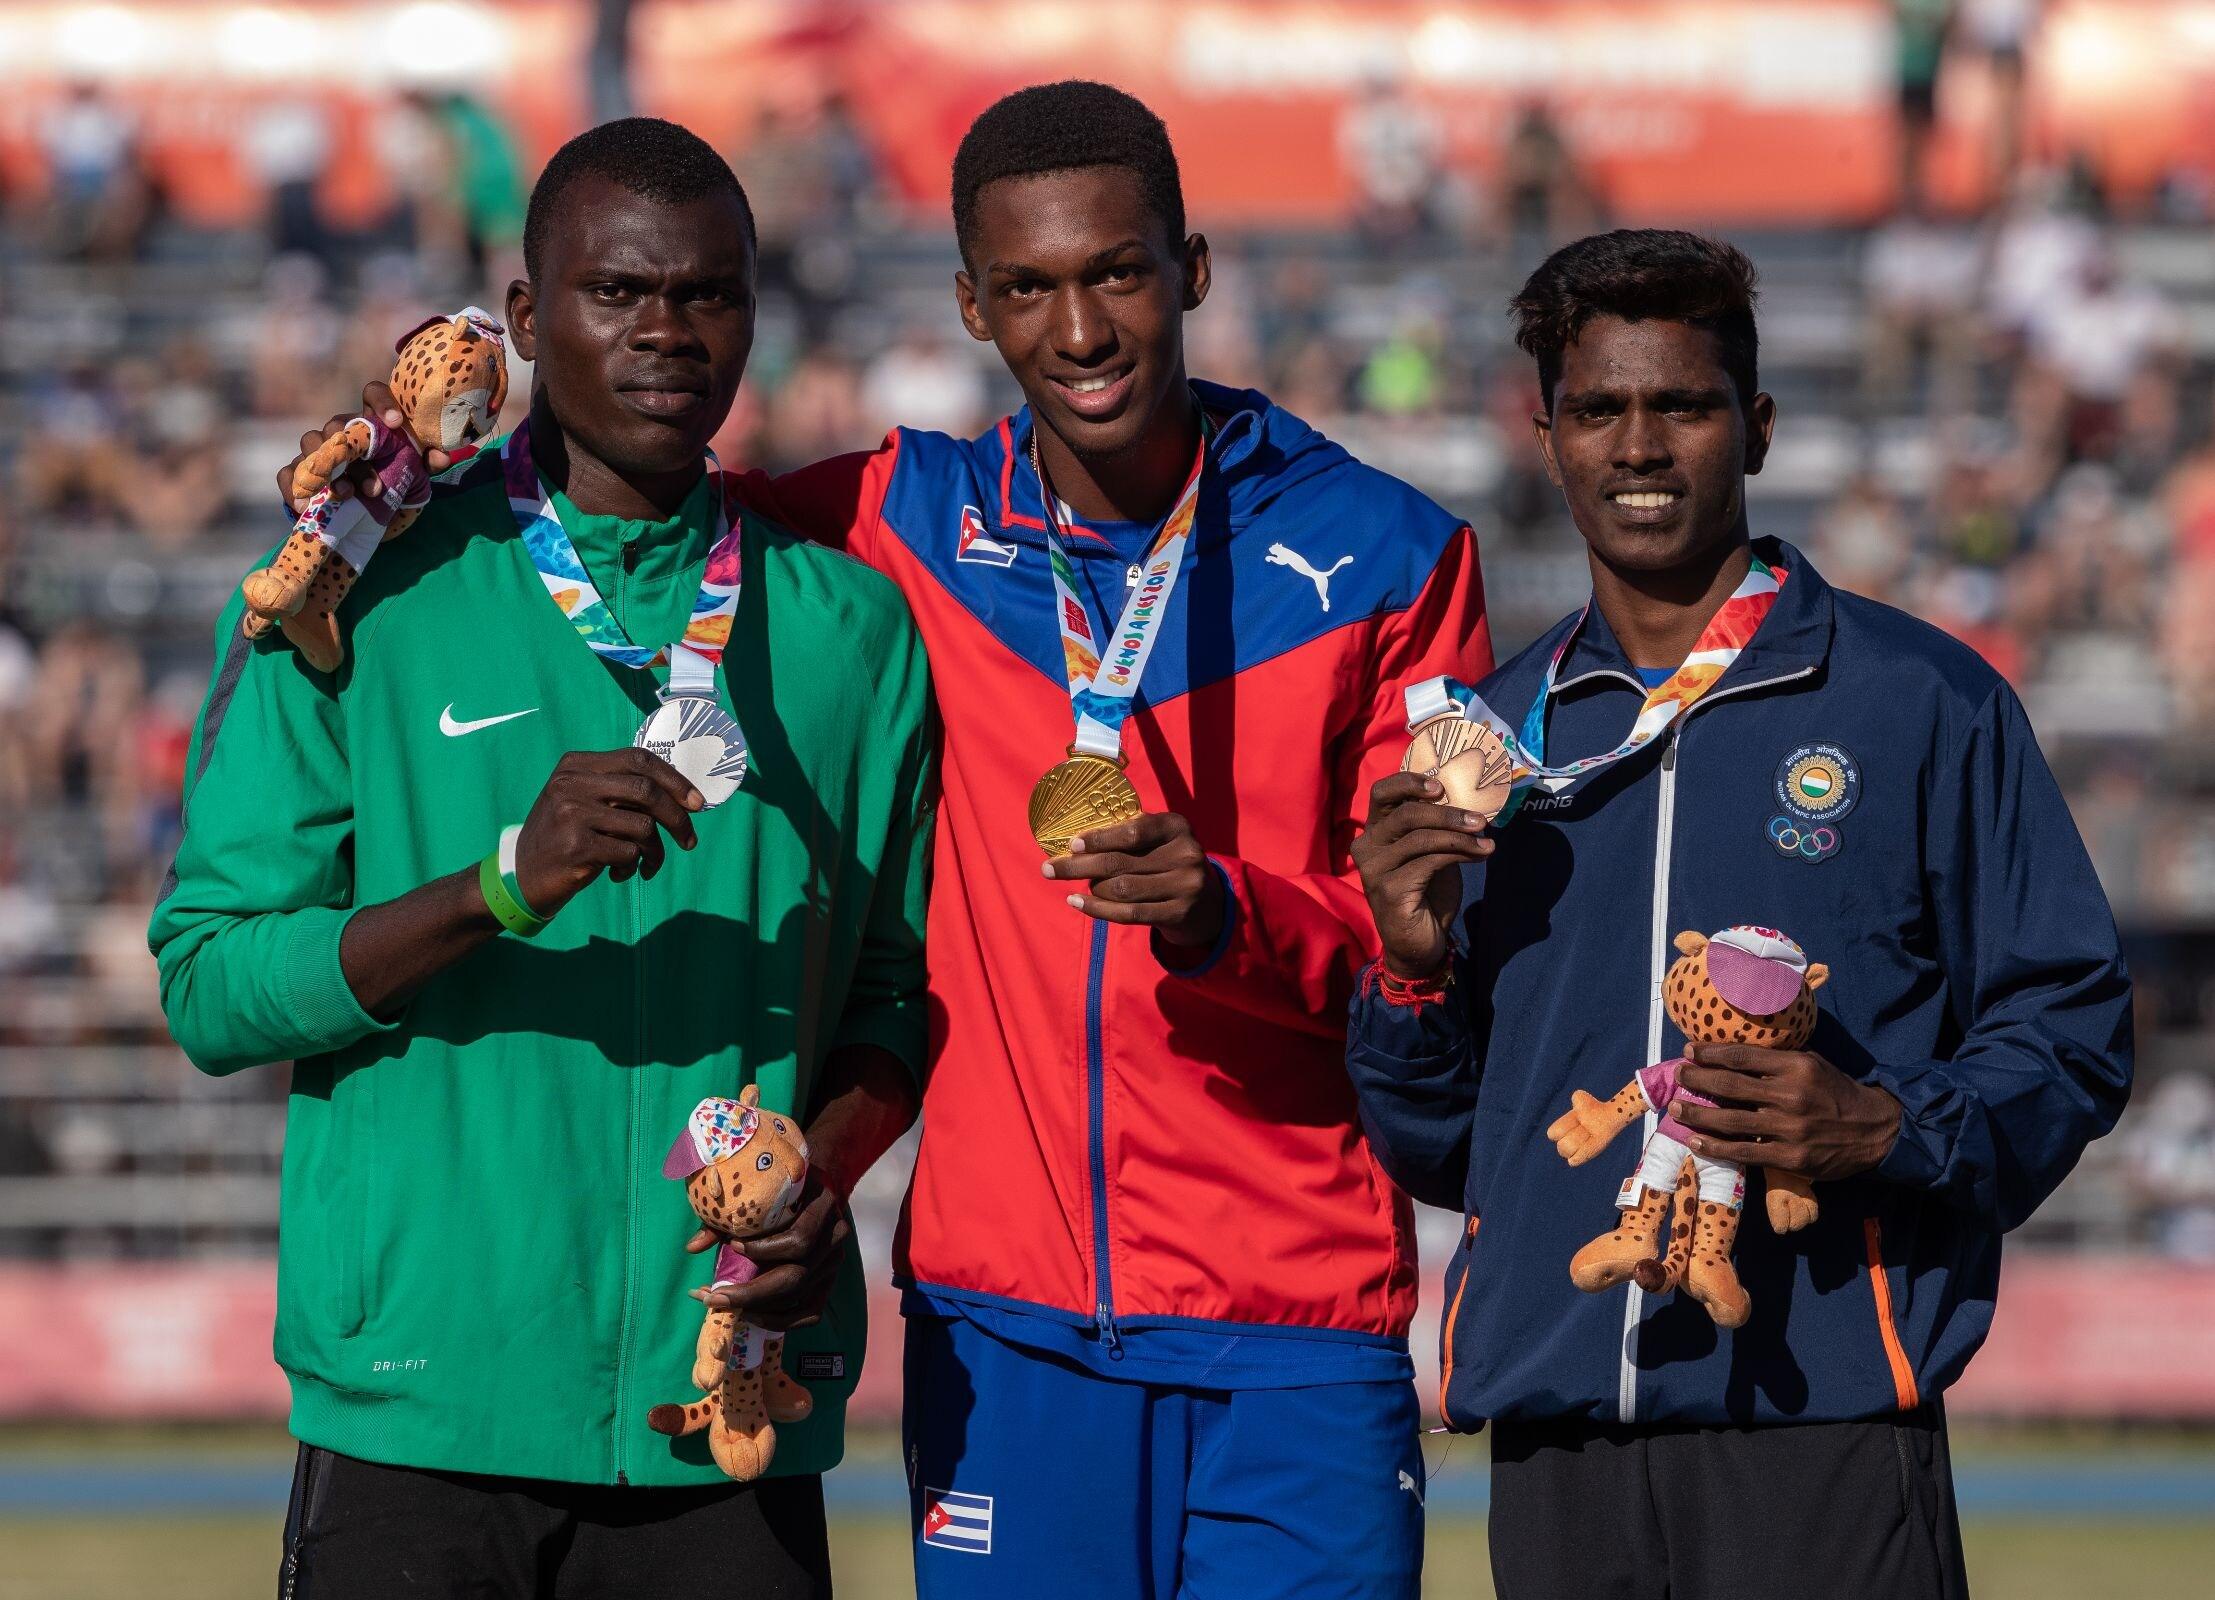 Buenos Aires 2018 - Athletics - Men's Triple Jump